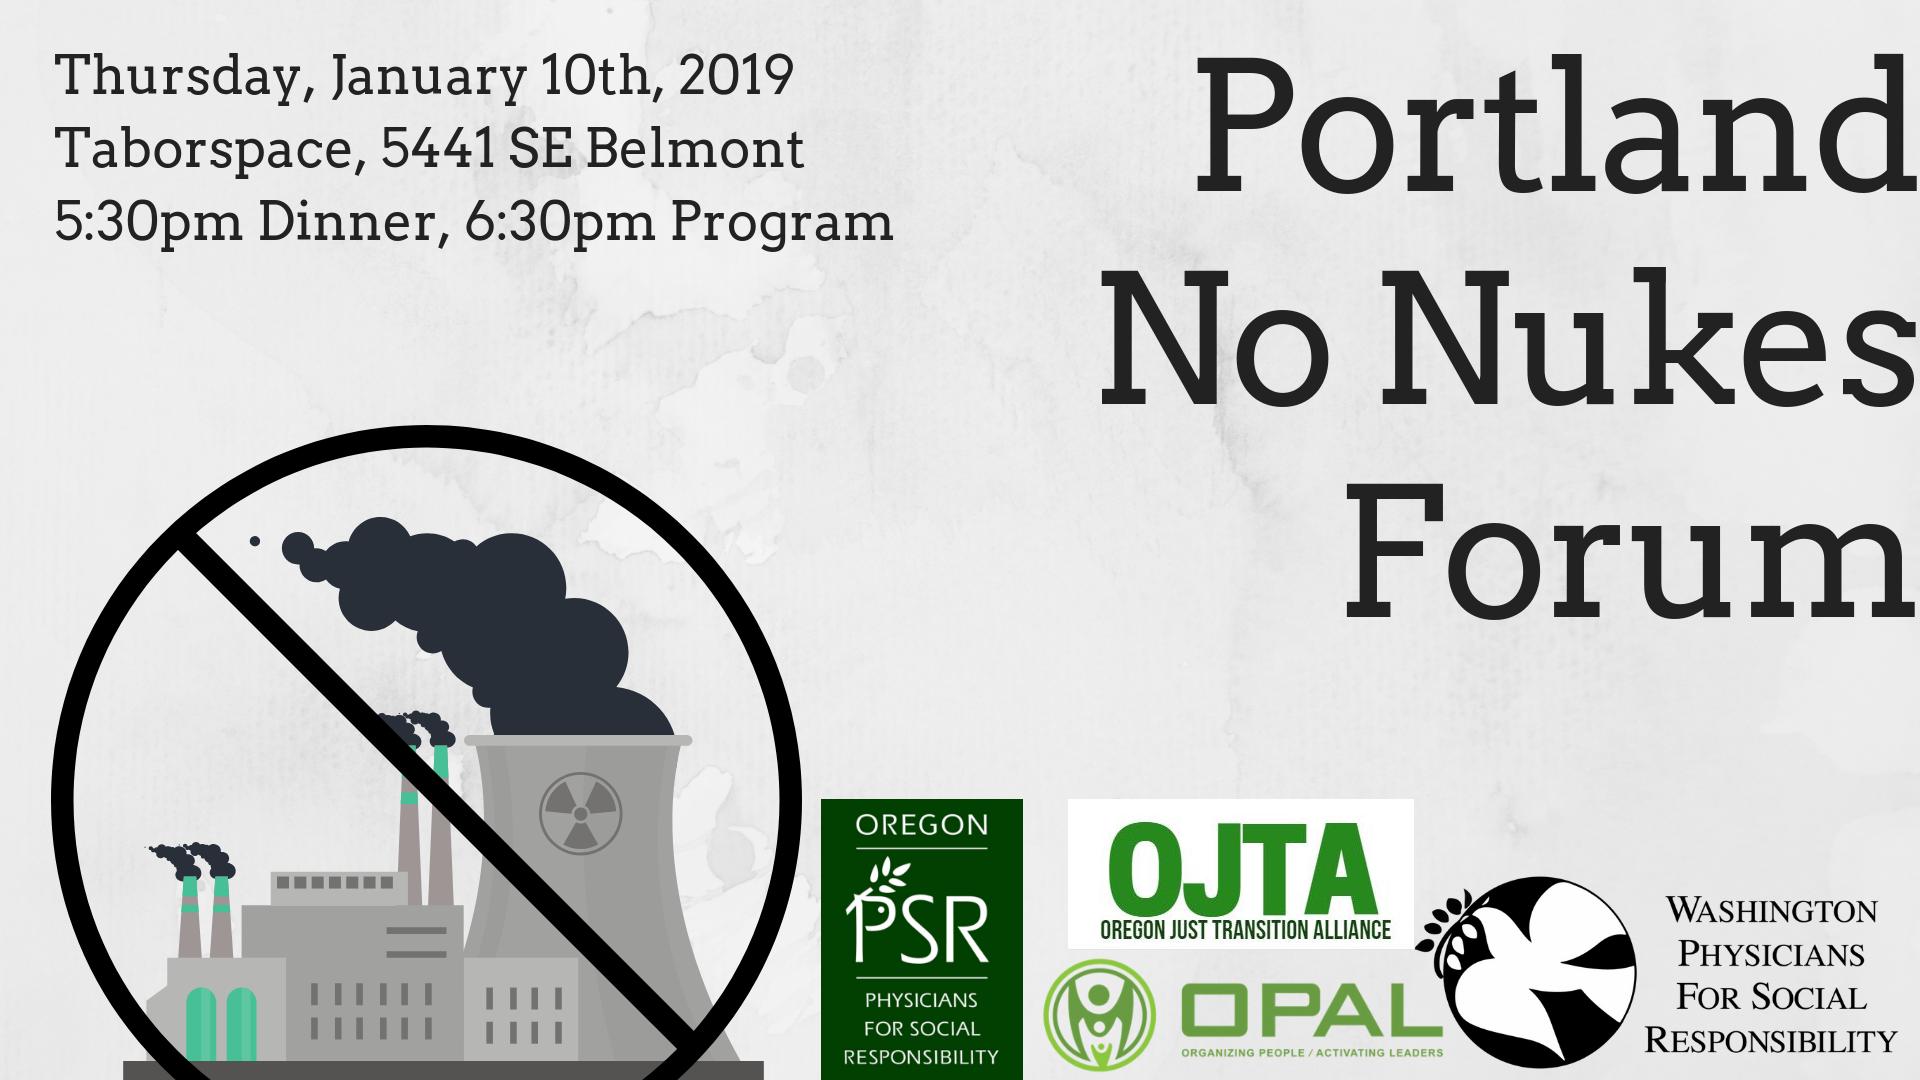 Portland_no_nukes_forum_(1).png